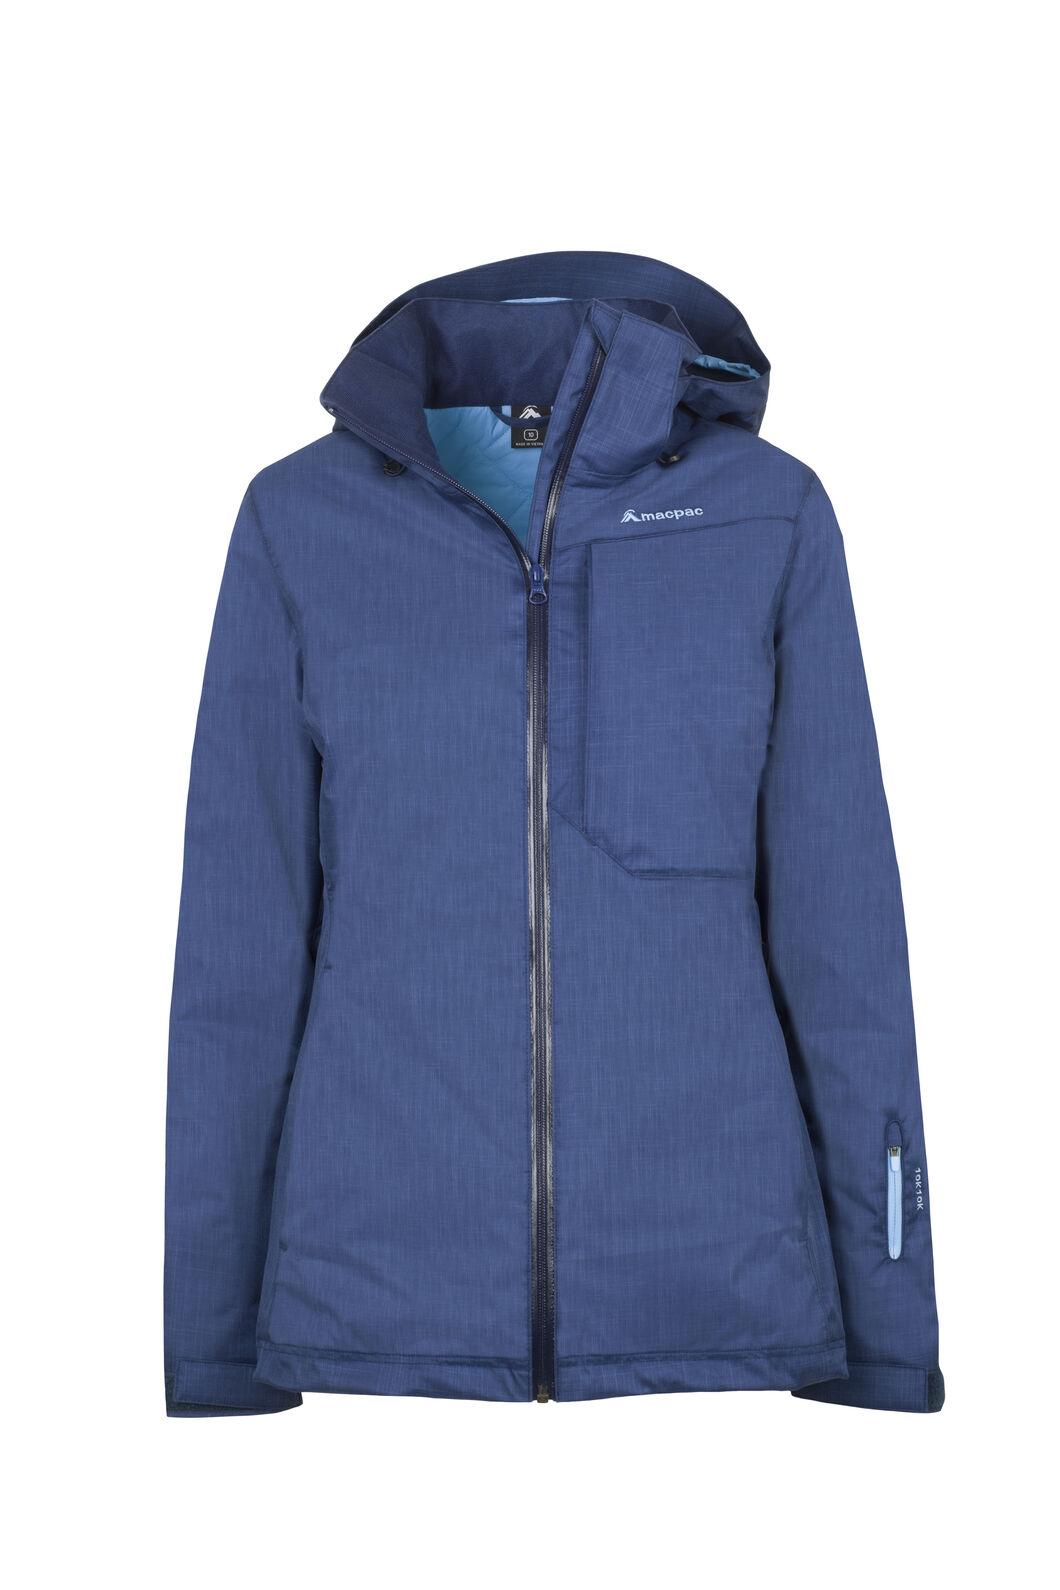 Macpac Powder Ski Jacket - Women's, Medieval/Ethereal Blue, hi-res